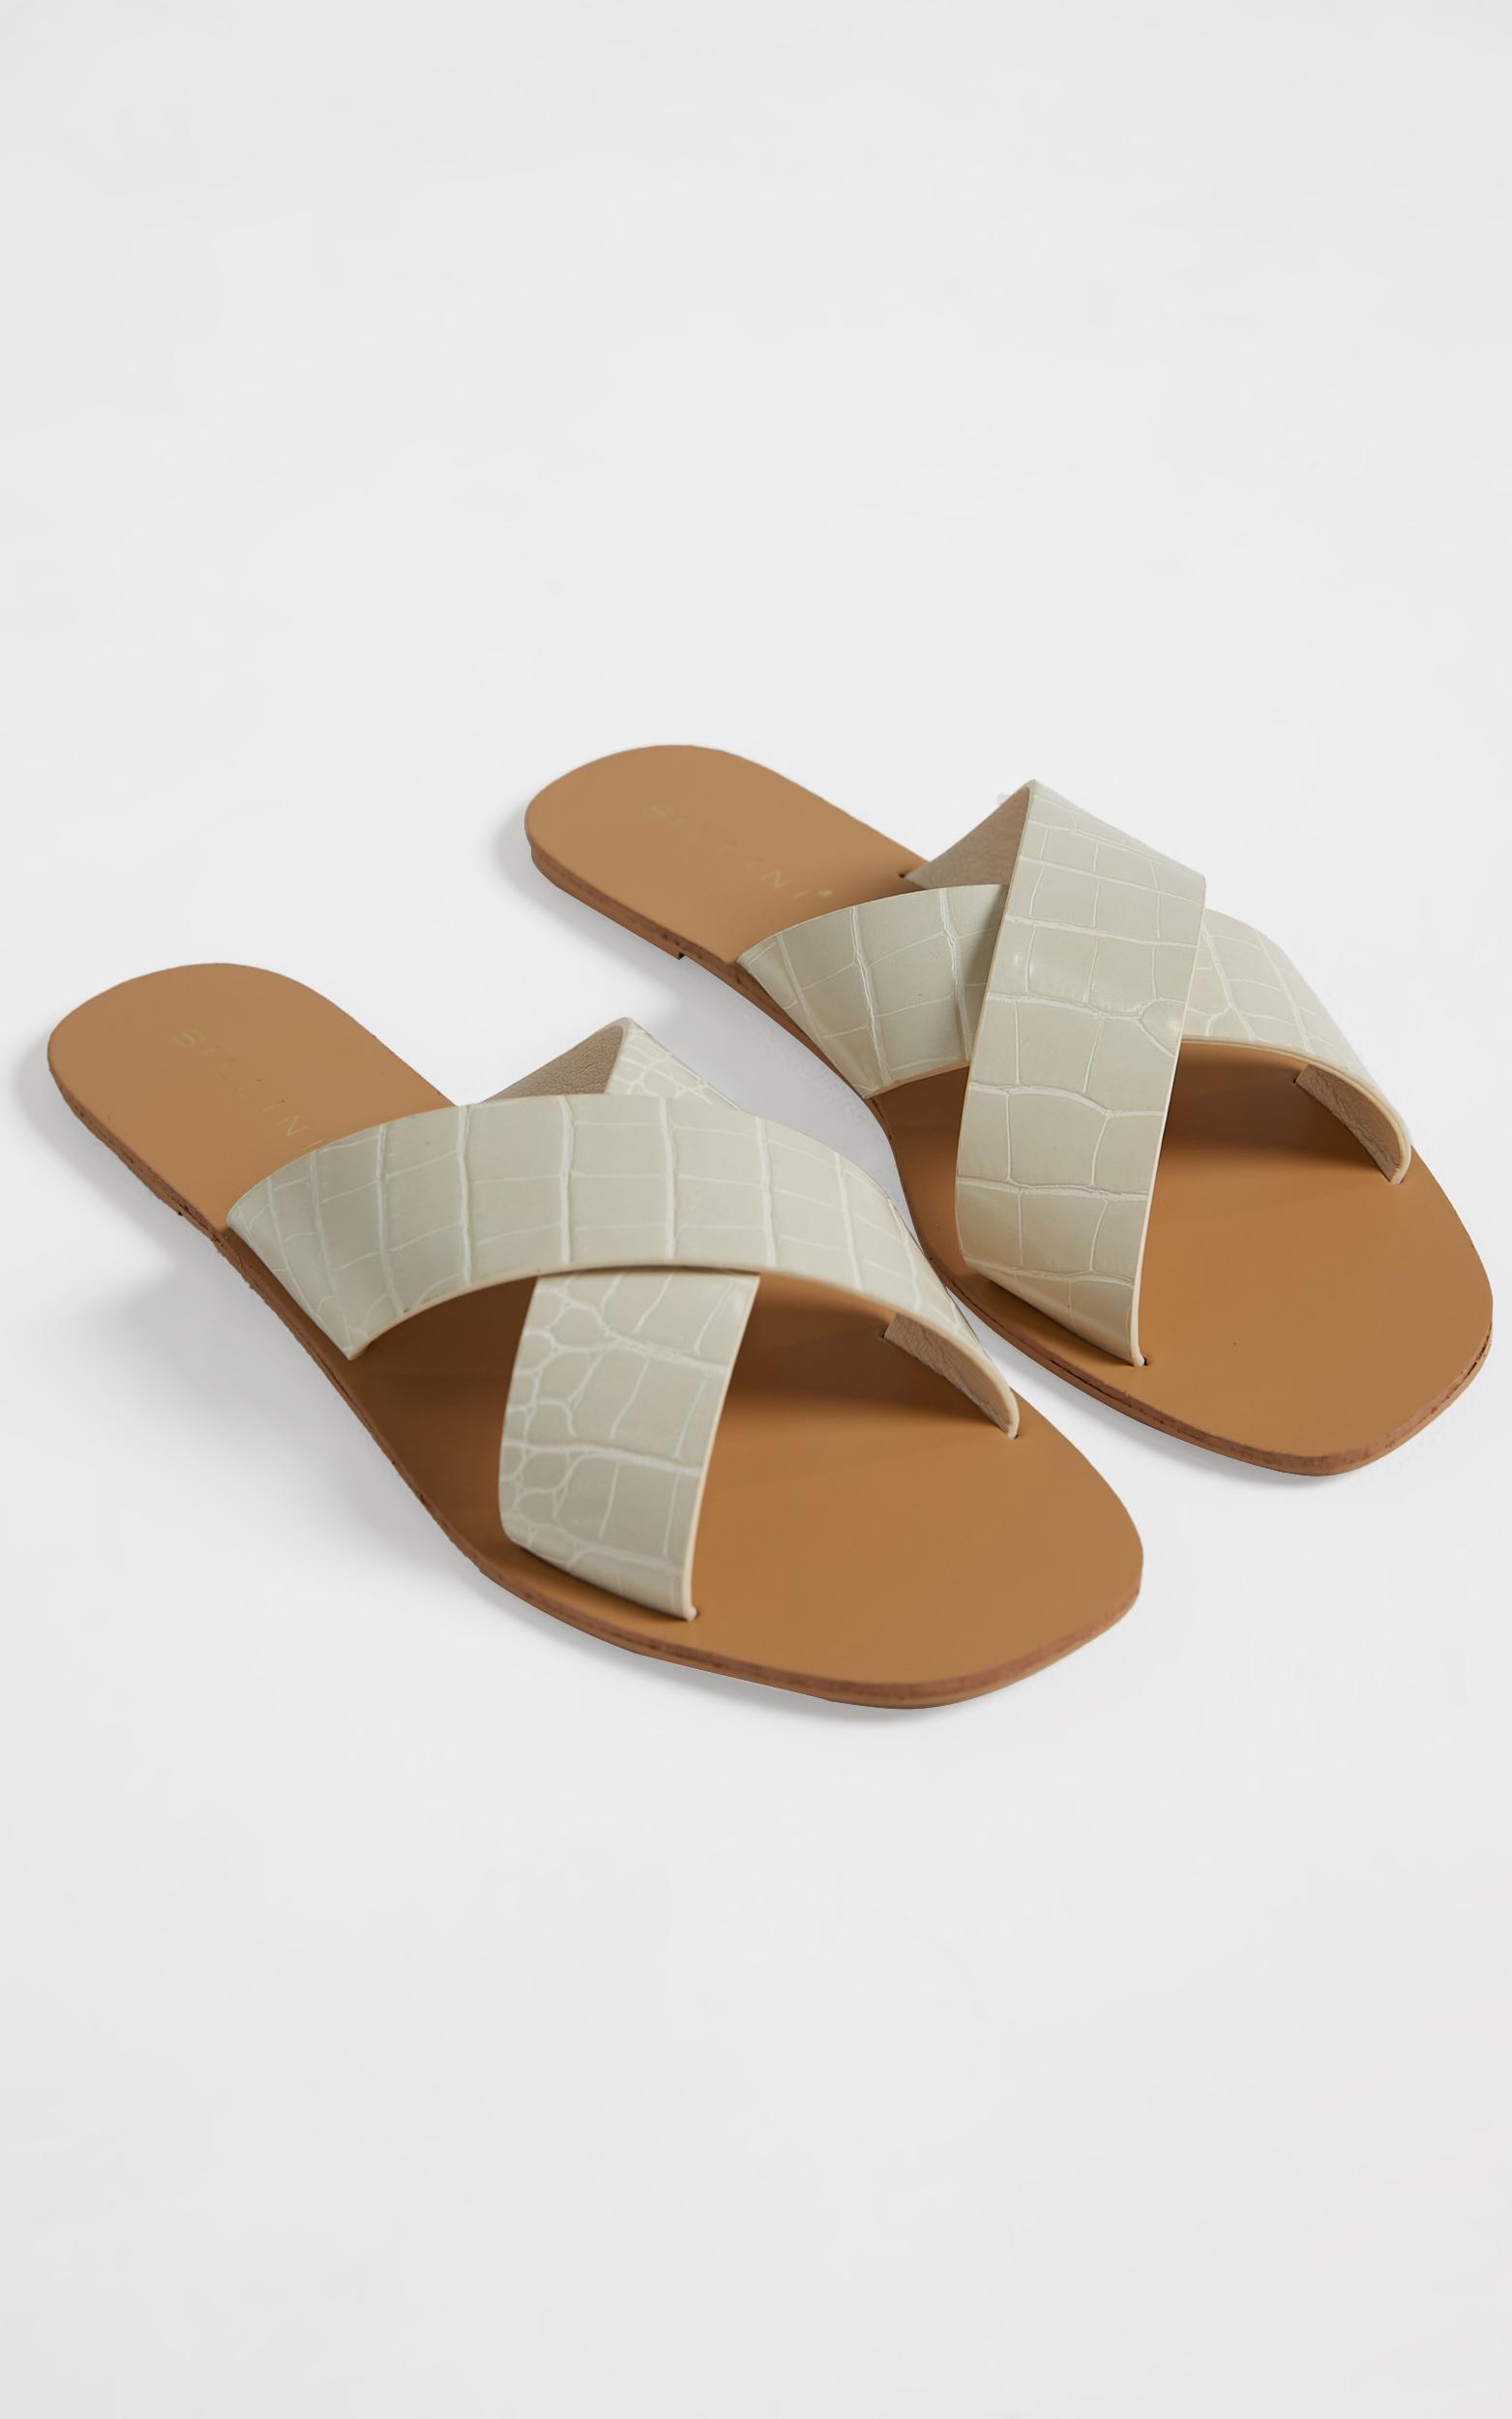 Billini - Hale Sandals in White Croc - 5, White, hi-res image number null